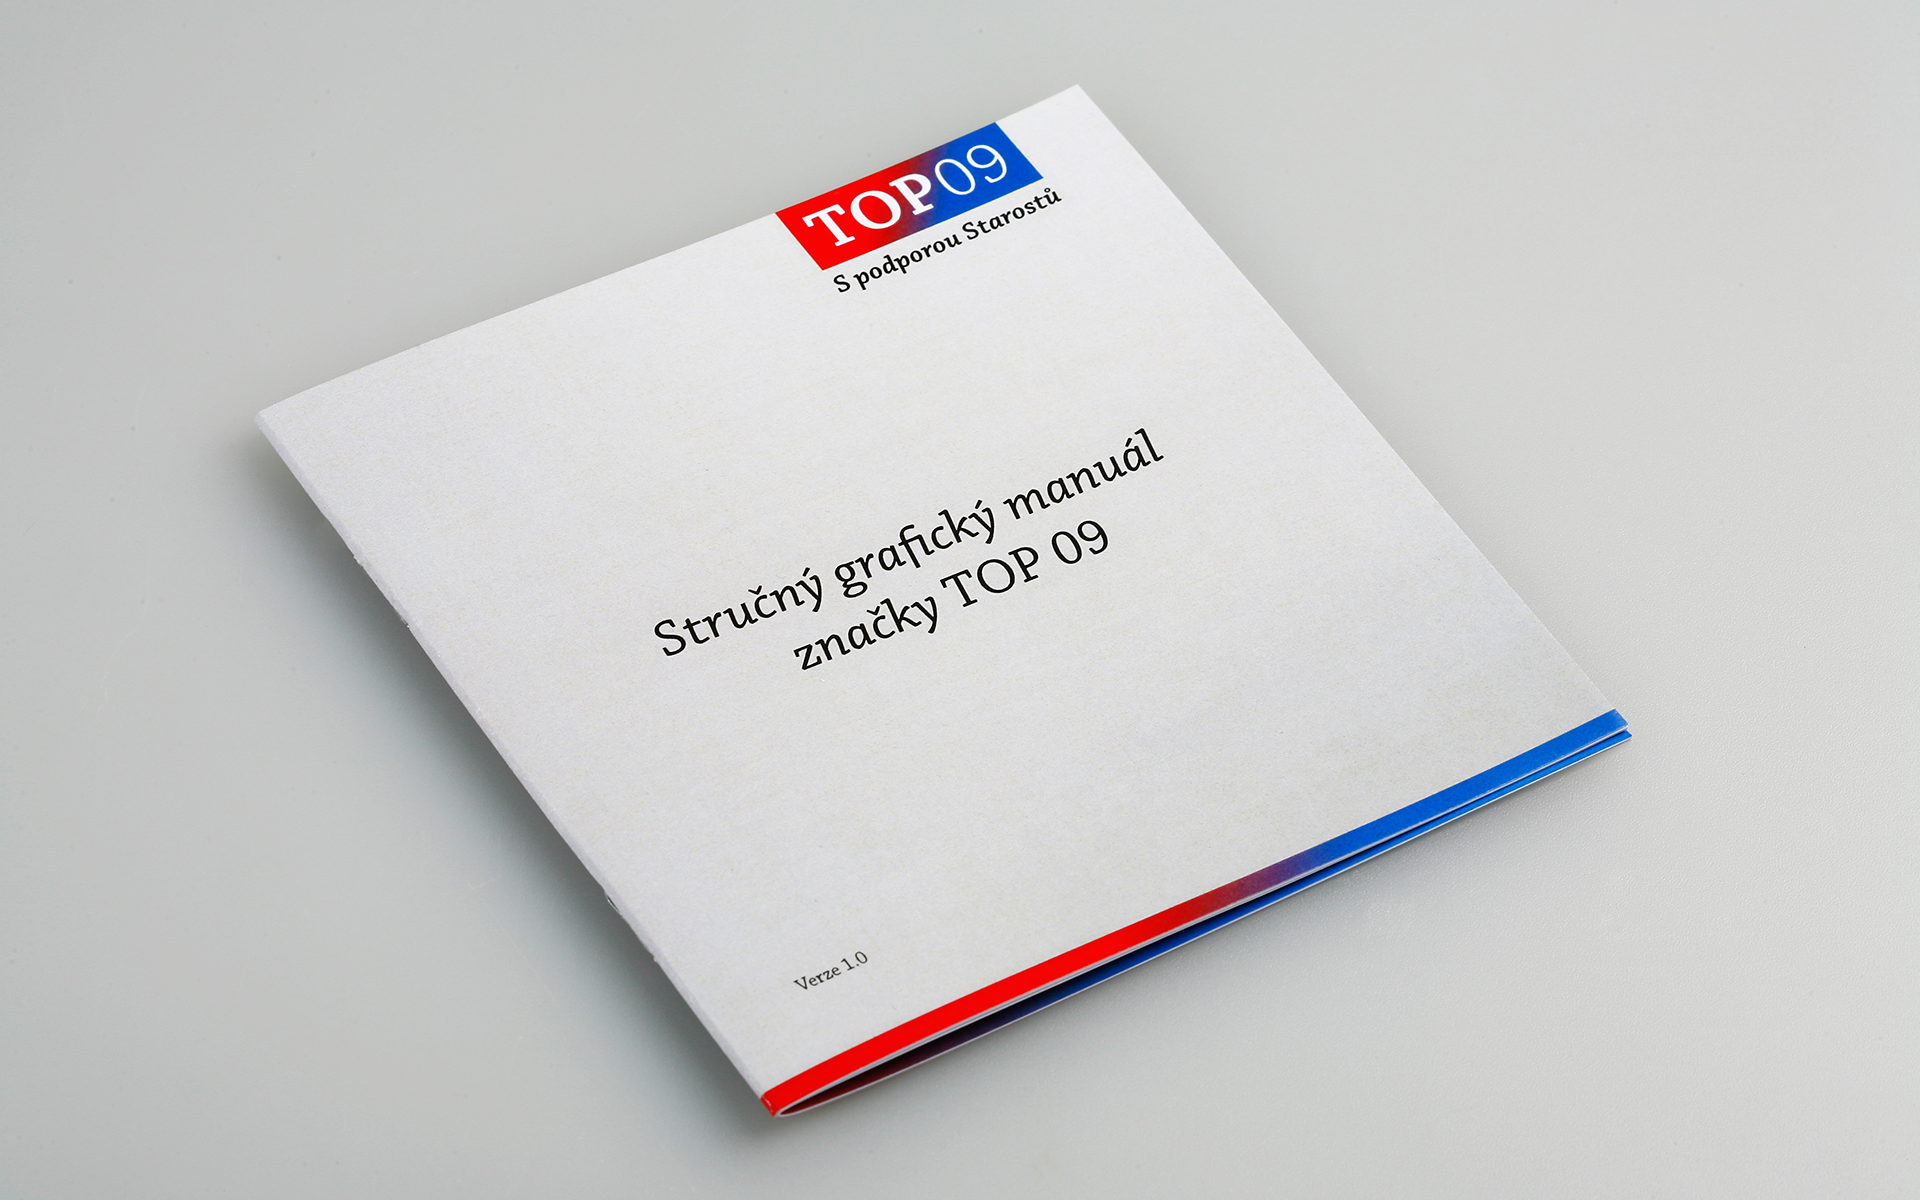 2009-TOP09-graficky-manual-MG_1646